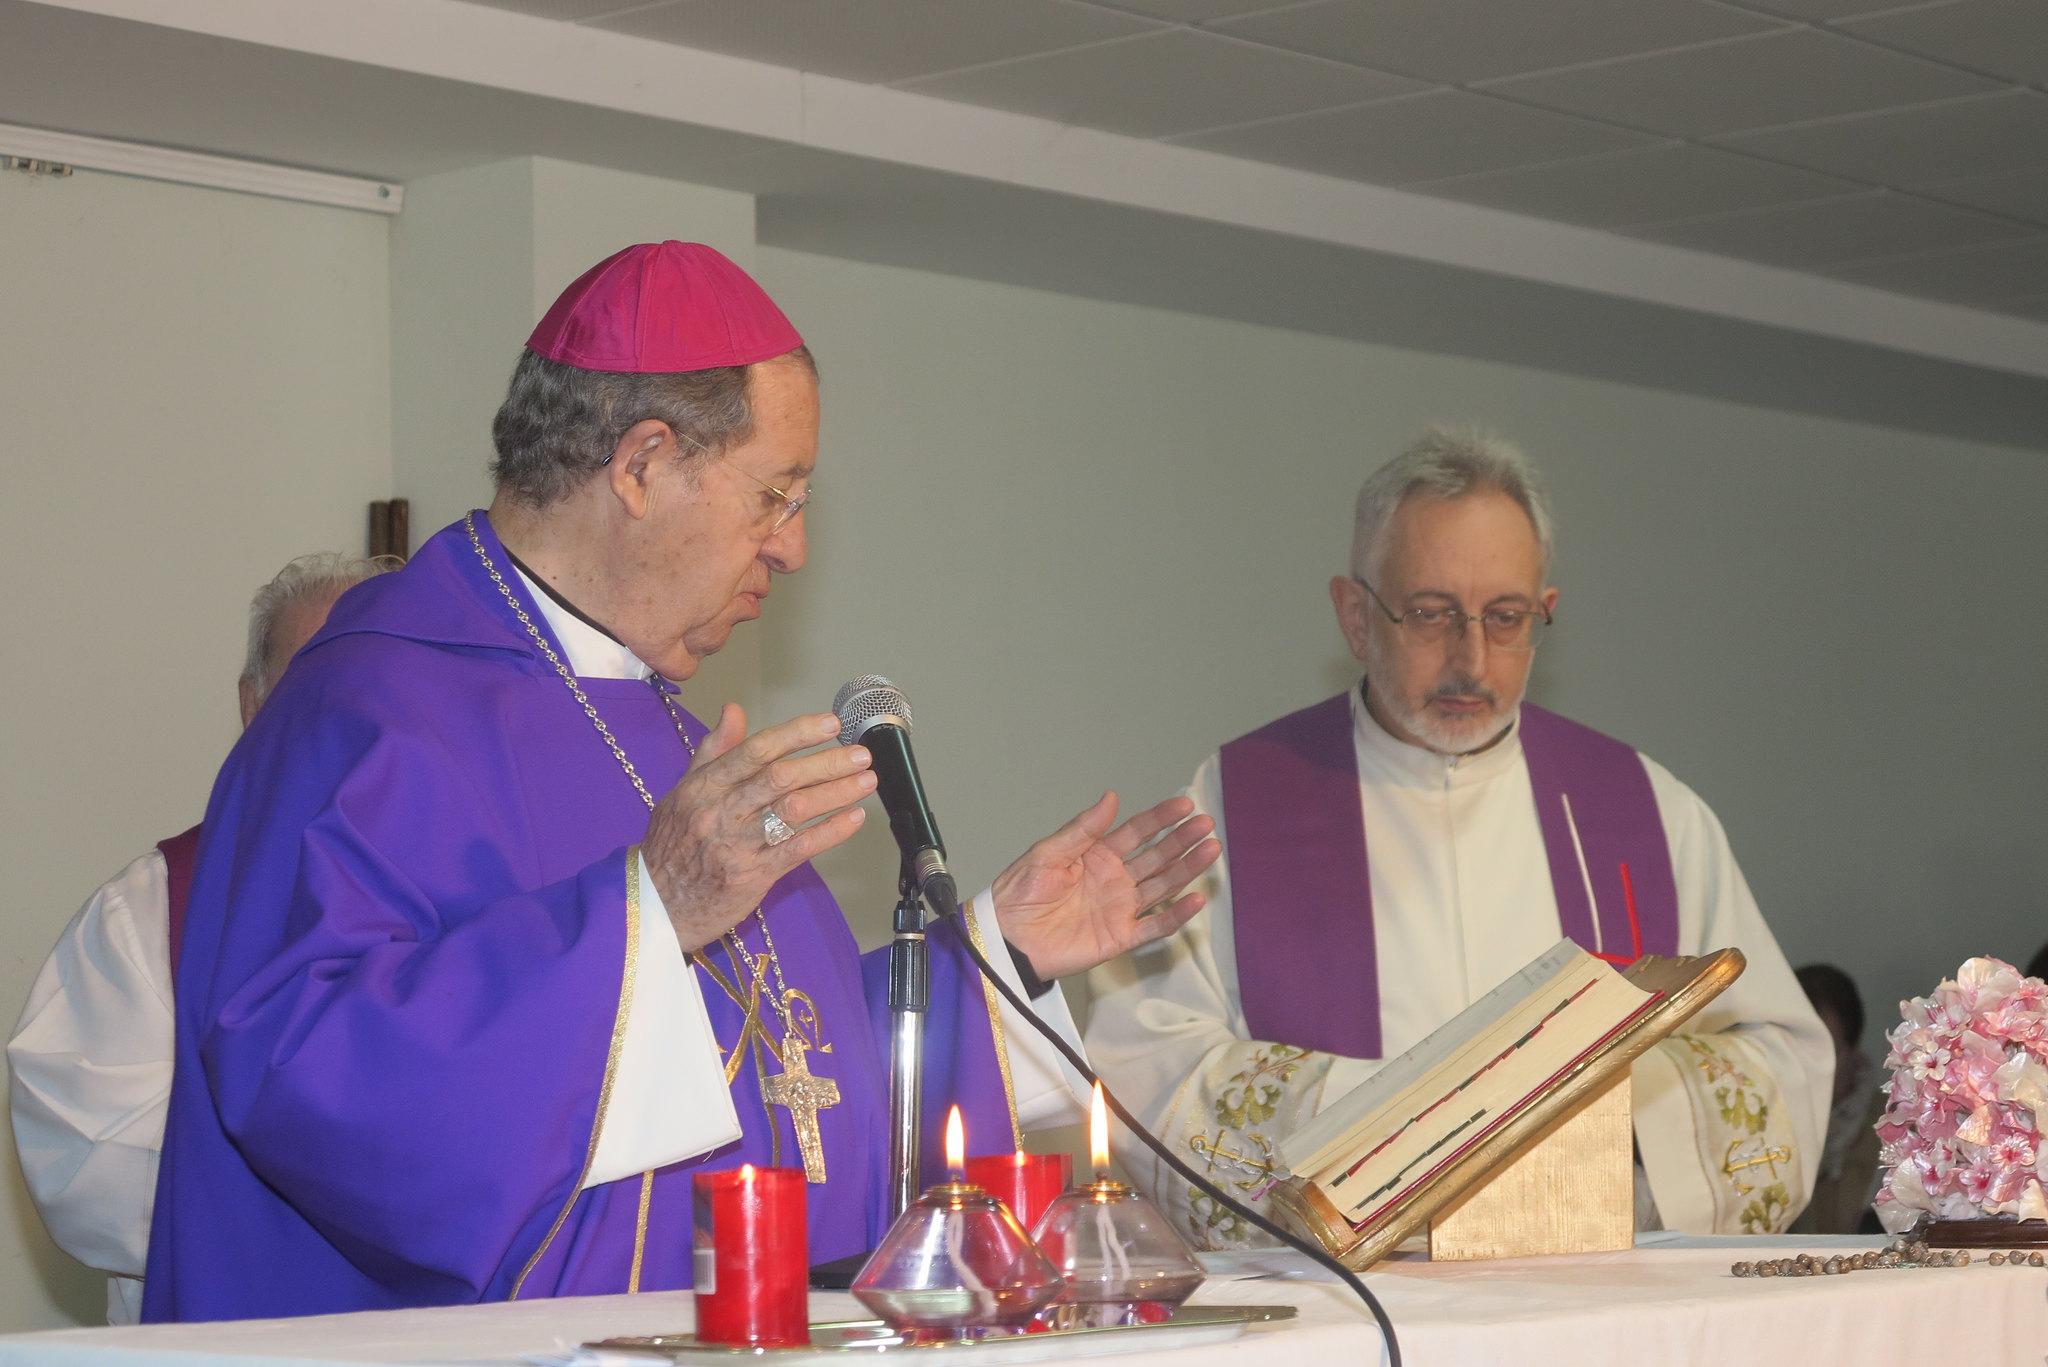 (2016-02-13) - Inauguración Virgen de Lourdes, La Molineta - Archivo La Molineta 2 (36)